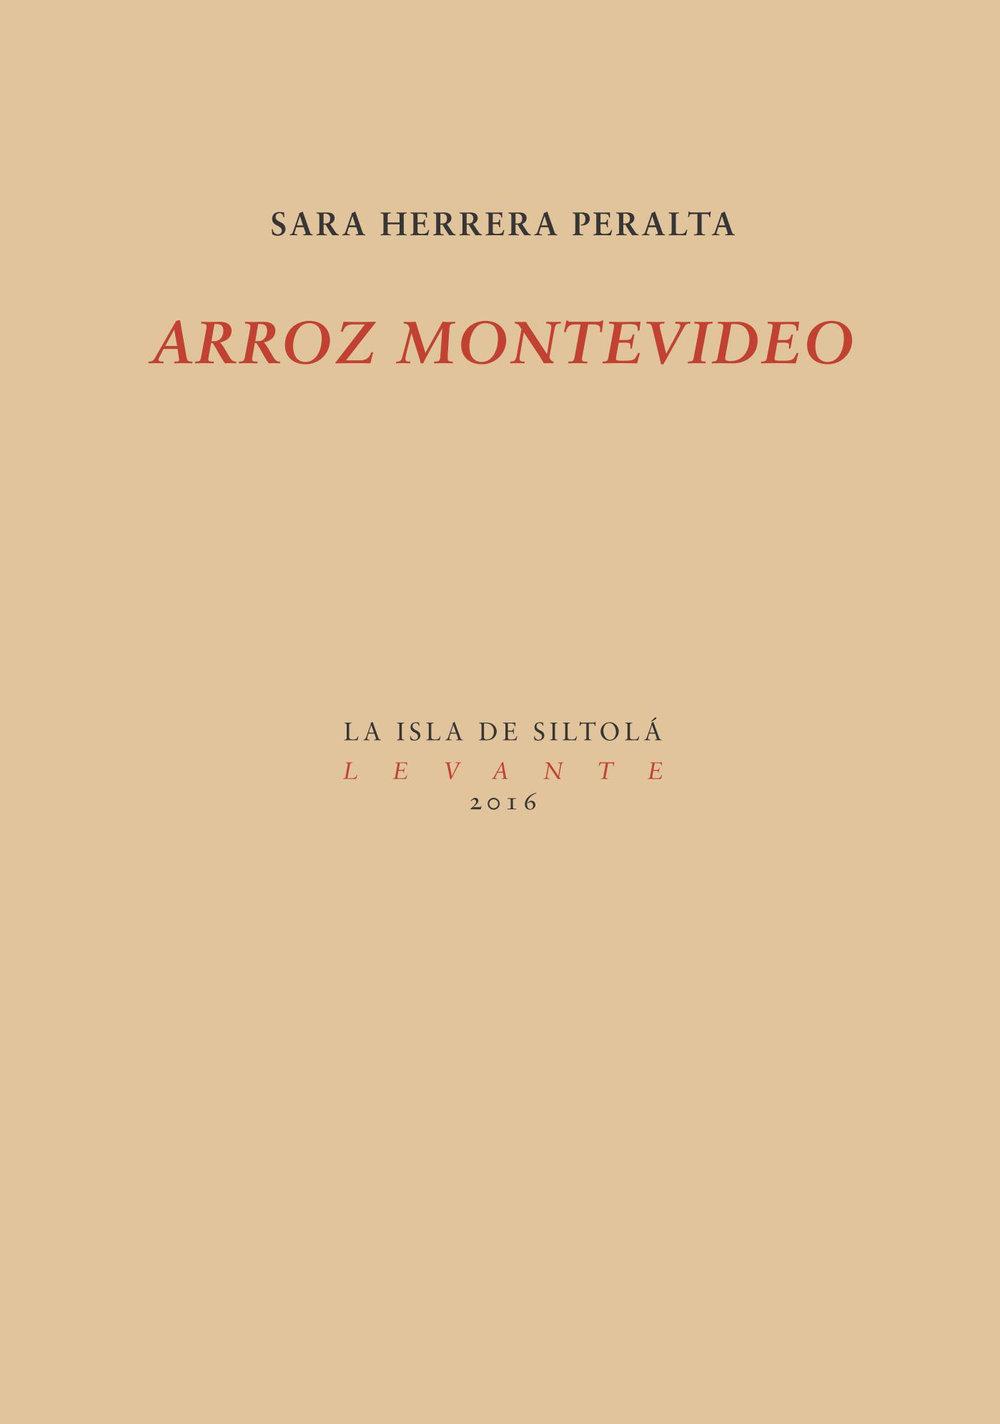 Cubierta ARROZ MONTEVIDEO.jpg